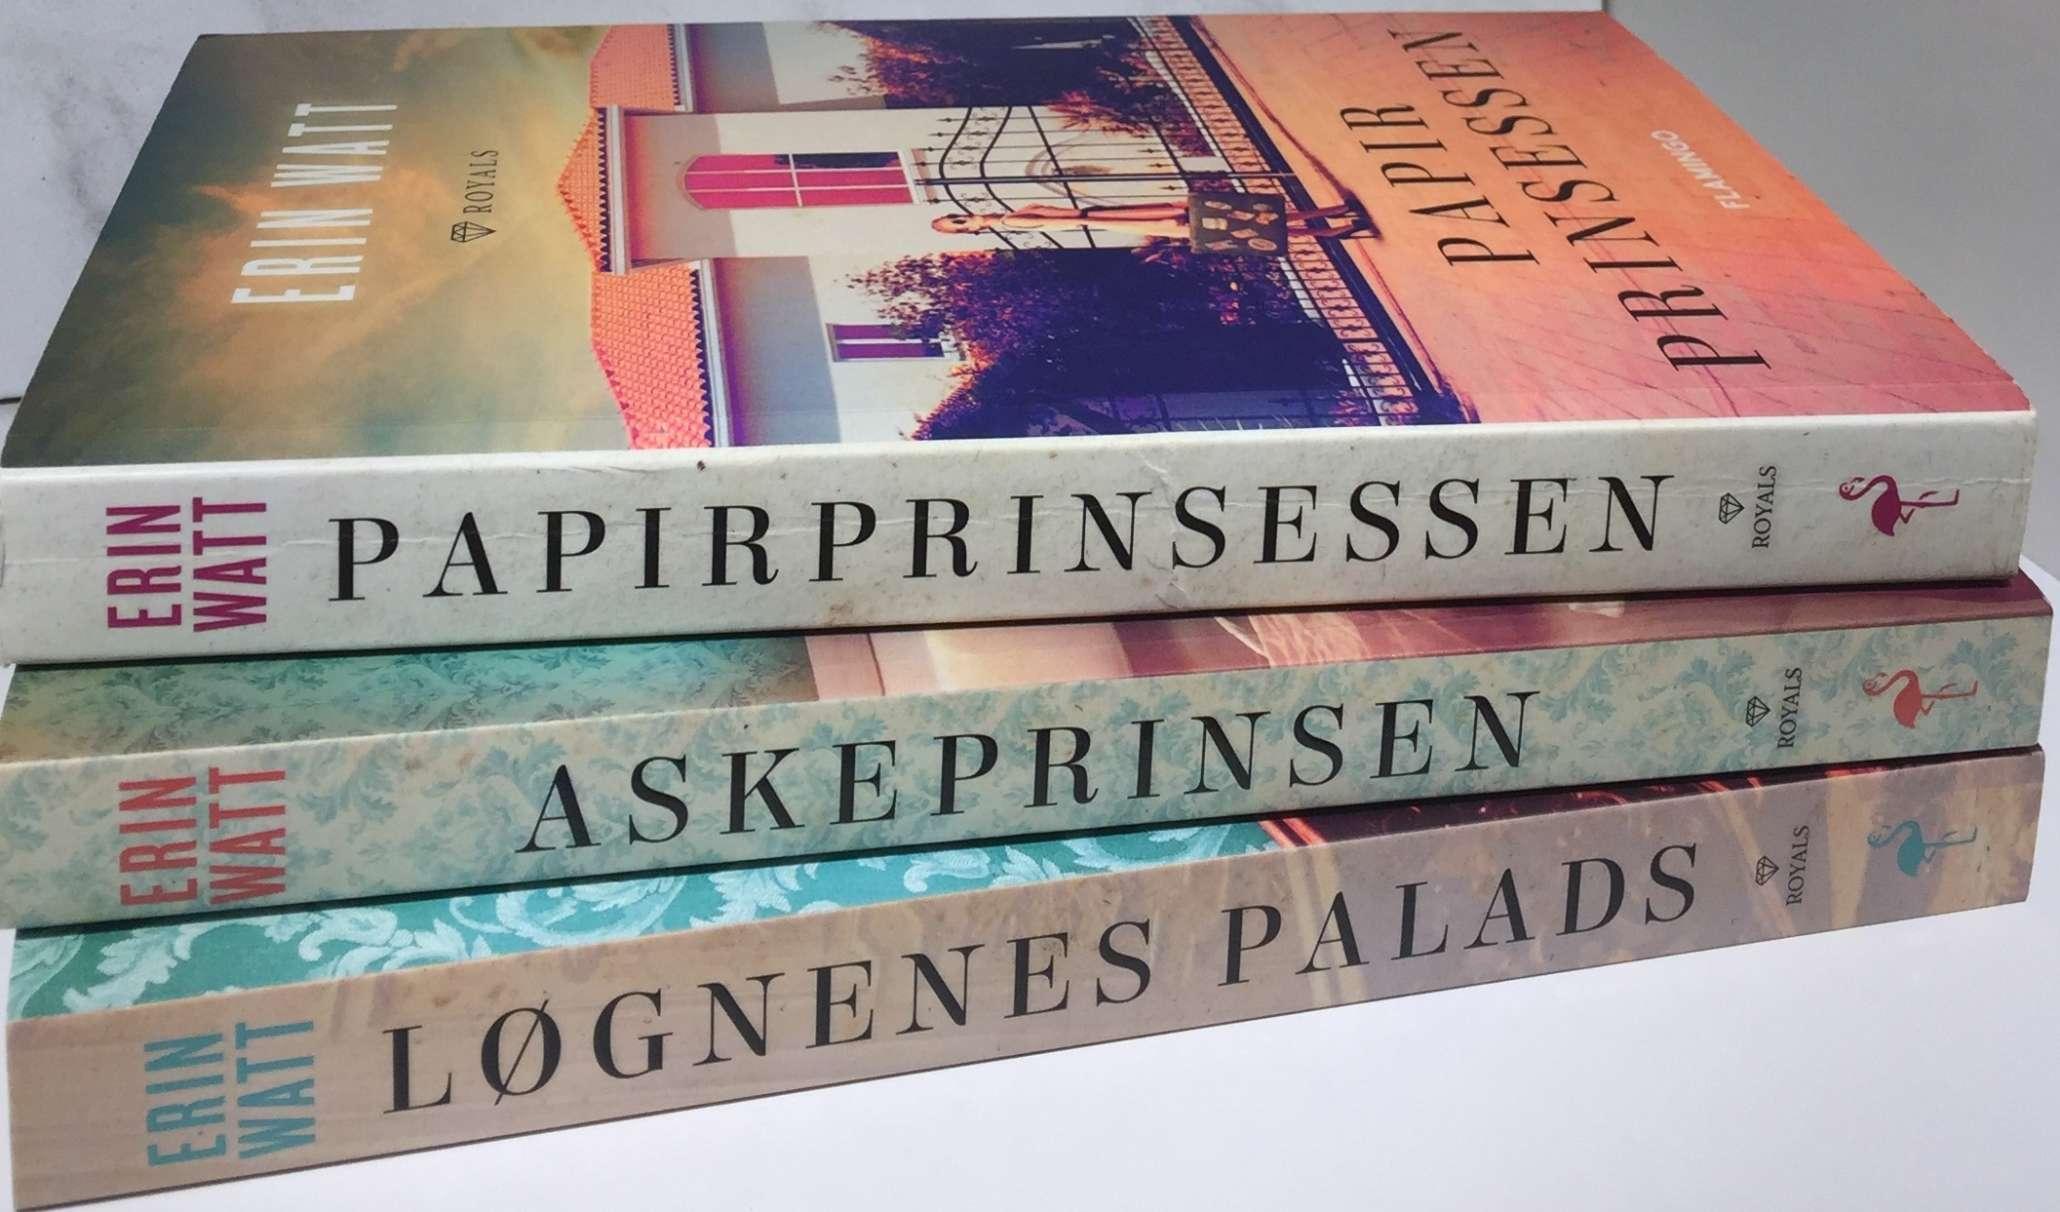 Erin Watt, Flamingo Books, Flamingo, Bøger der forfører, The Royals, Papirprinsessen, Akeprinsen, Løgnenes Palads, Krummeskrummelurer, Boganmeldelse, Anmeldereksemplar